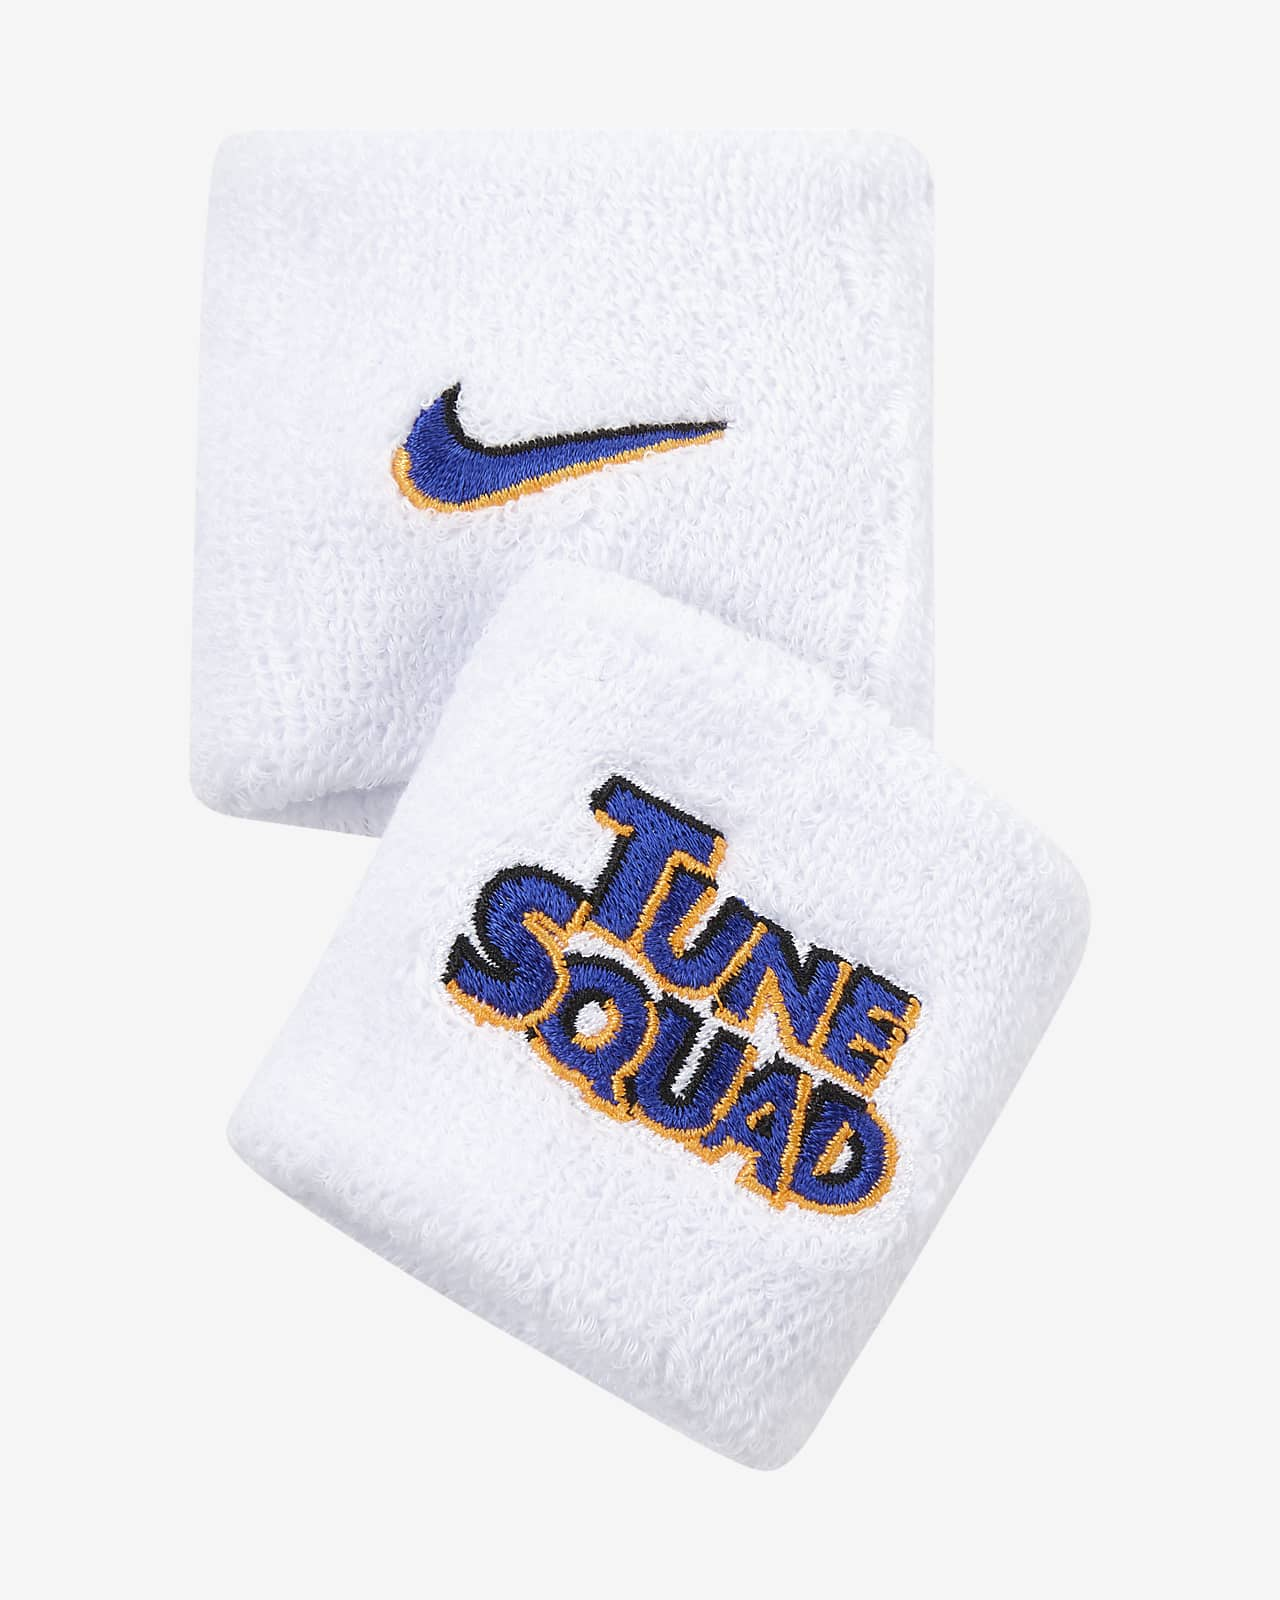 Nike Swoosh x Space Jam: A New Legacy Polsbandjes (2 stuks)